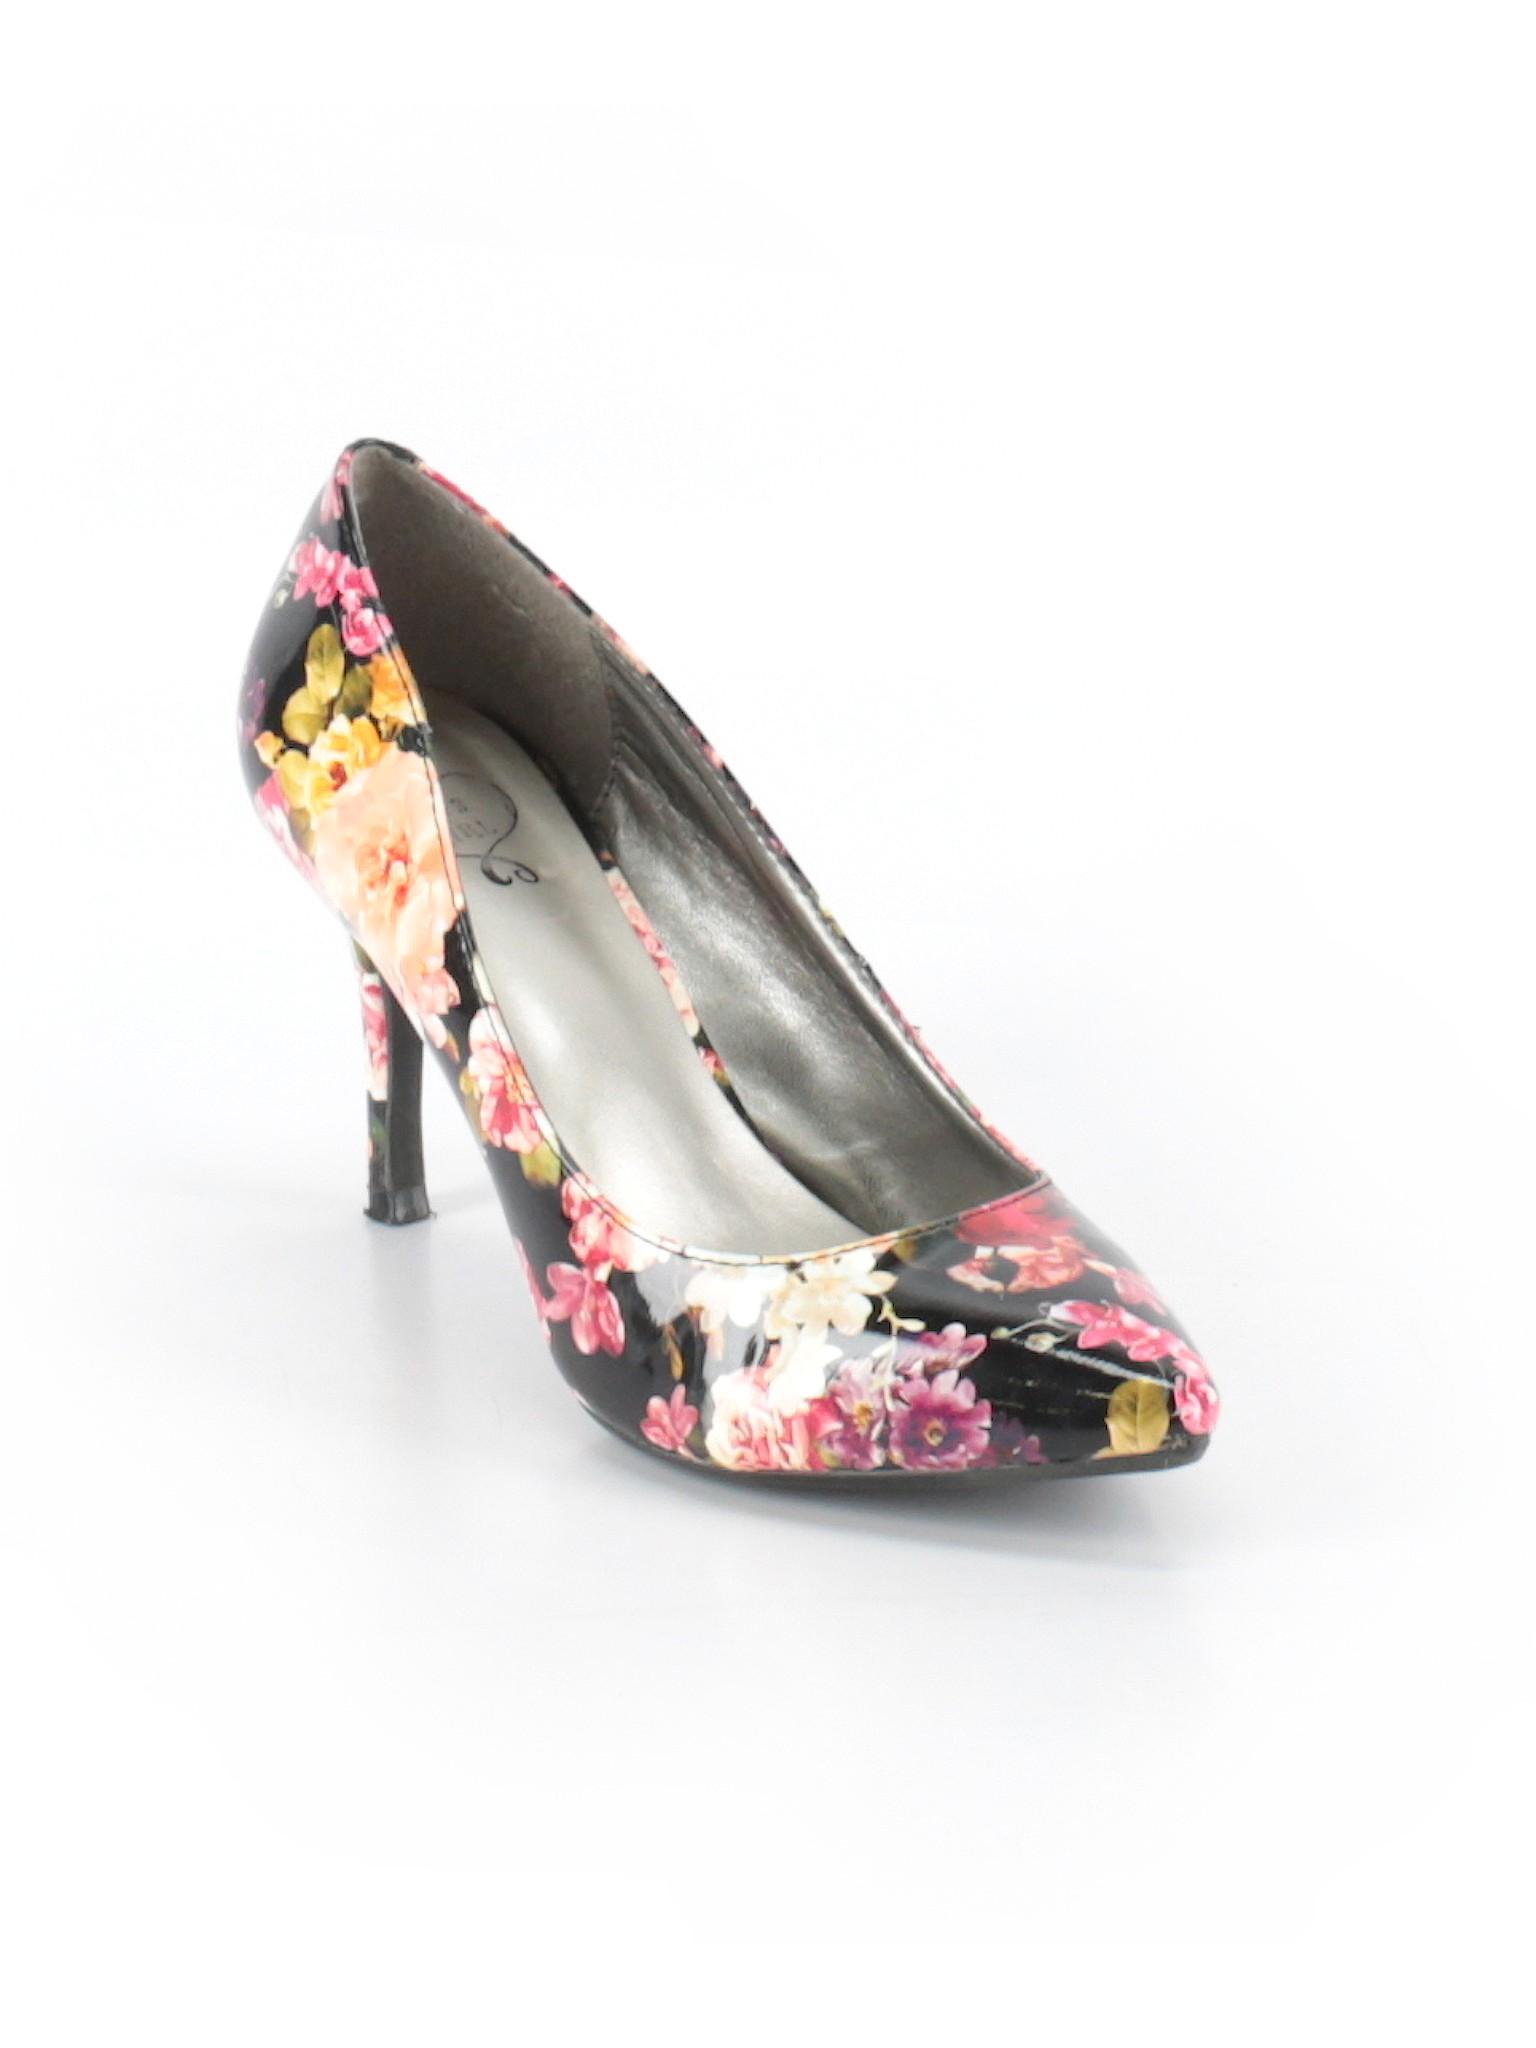 143 Heels 143 promotion promotion Heels Boutique Heels Boutique Girl Girl Boutique Girl promotion promotion 143 Boutique fvOqO5rxwA